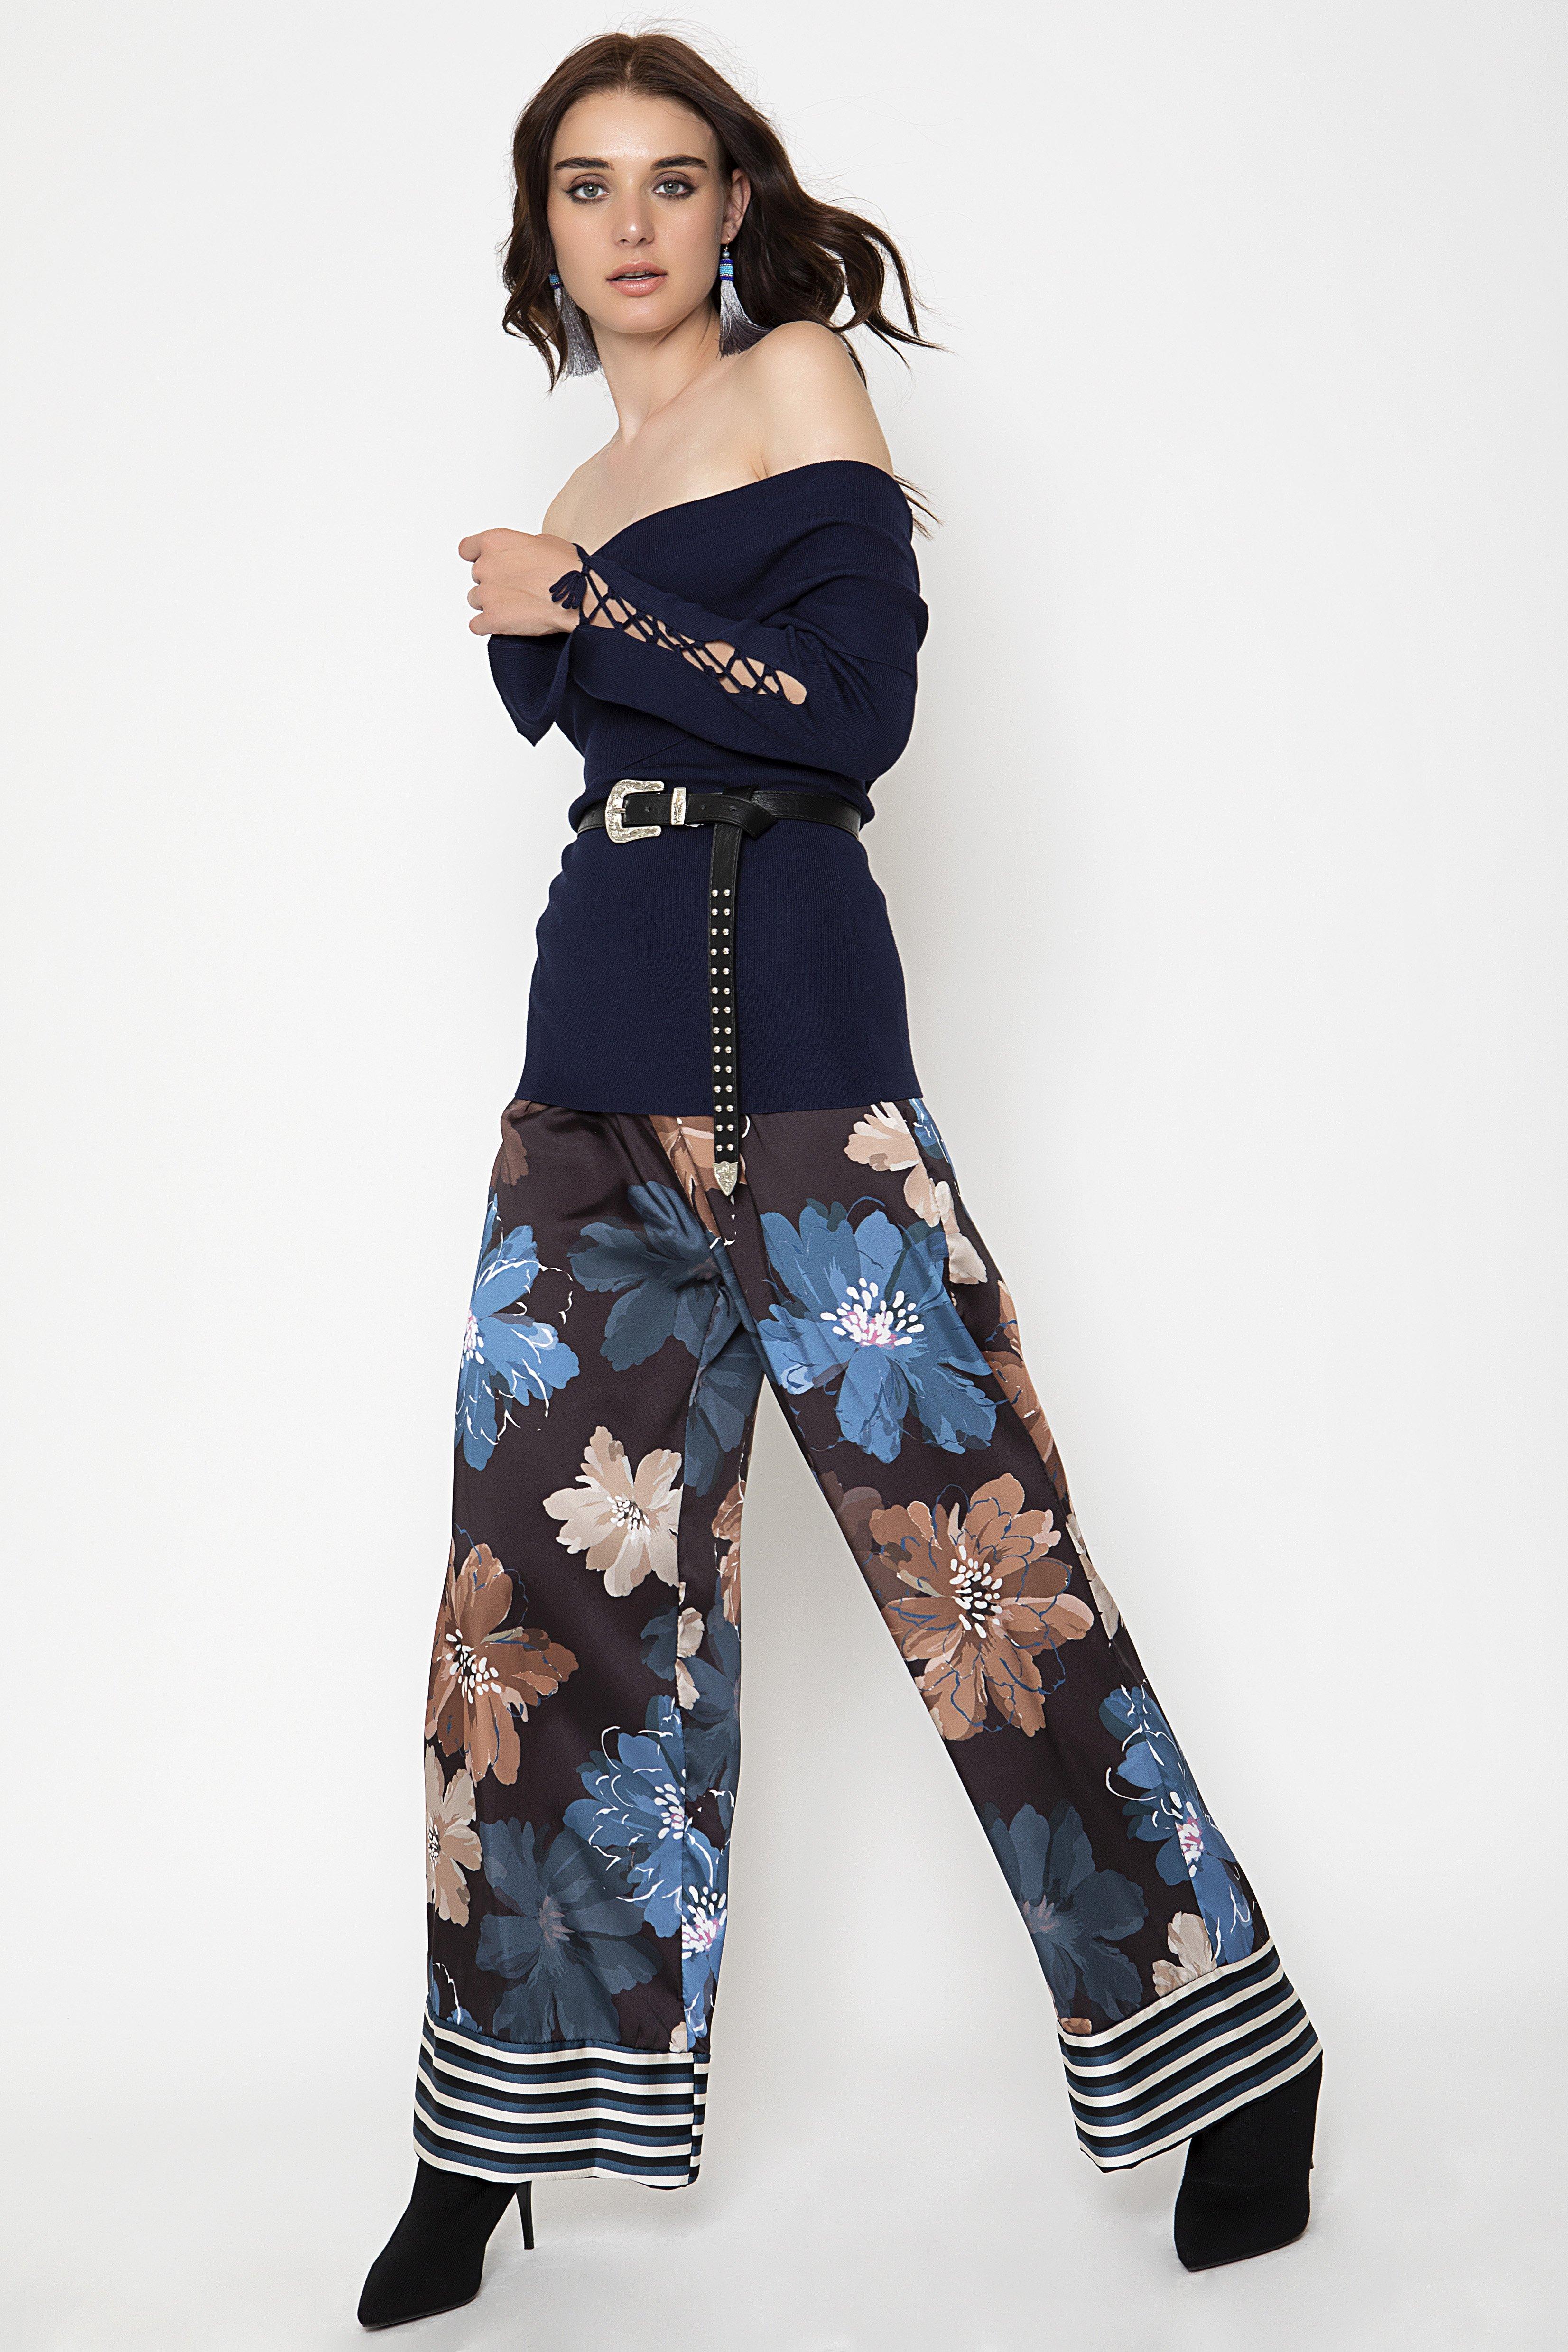 WIDE LEG ΠΑΝΤΕΛΟΝΑ - Μπλε clothes   παντελόνια